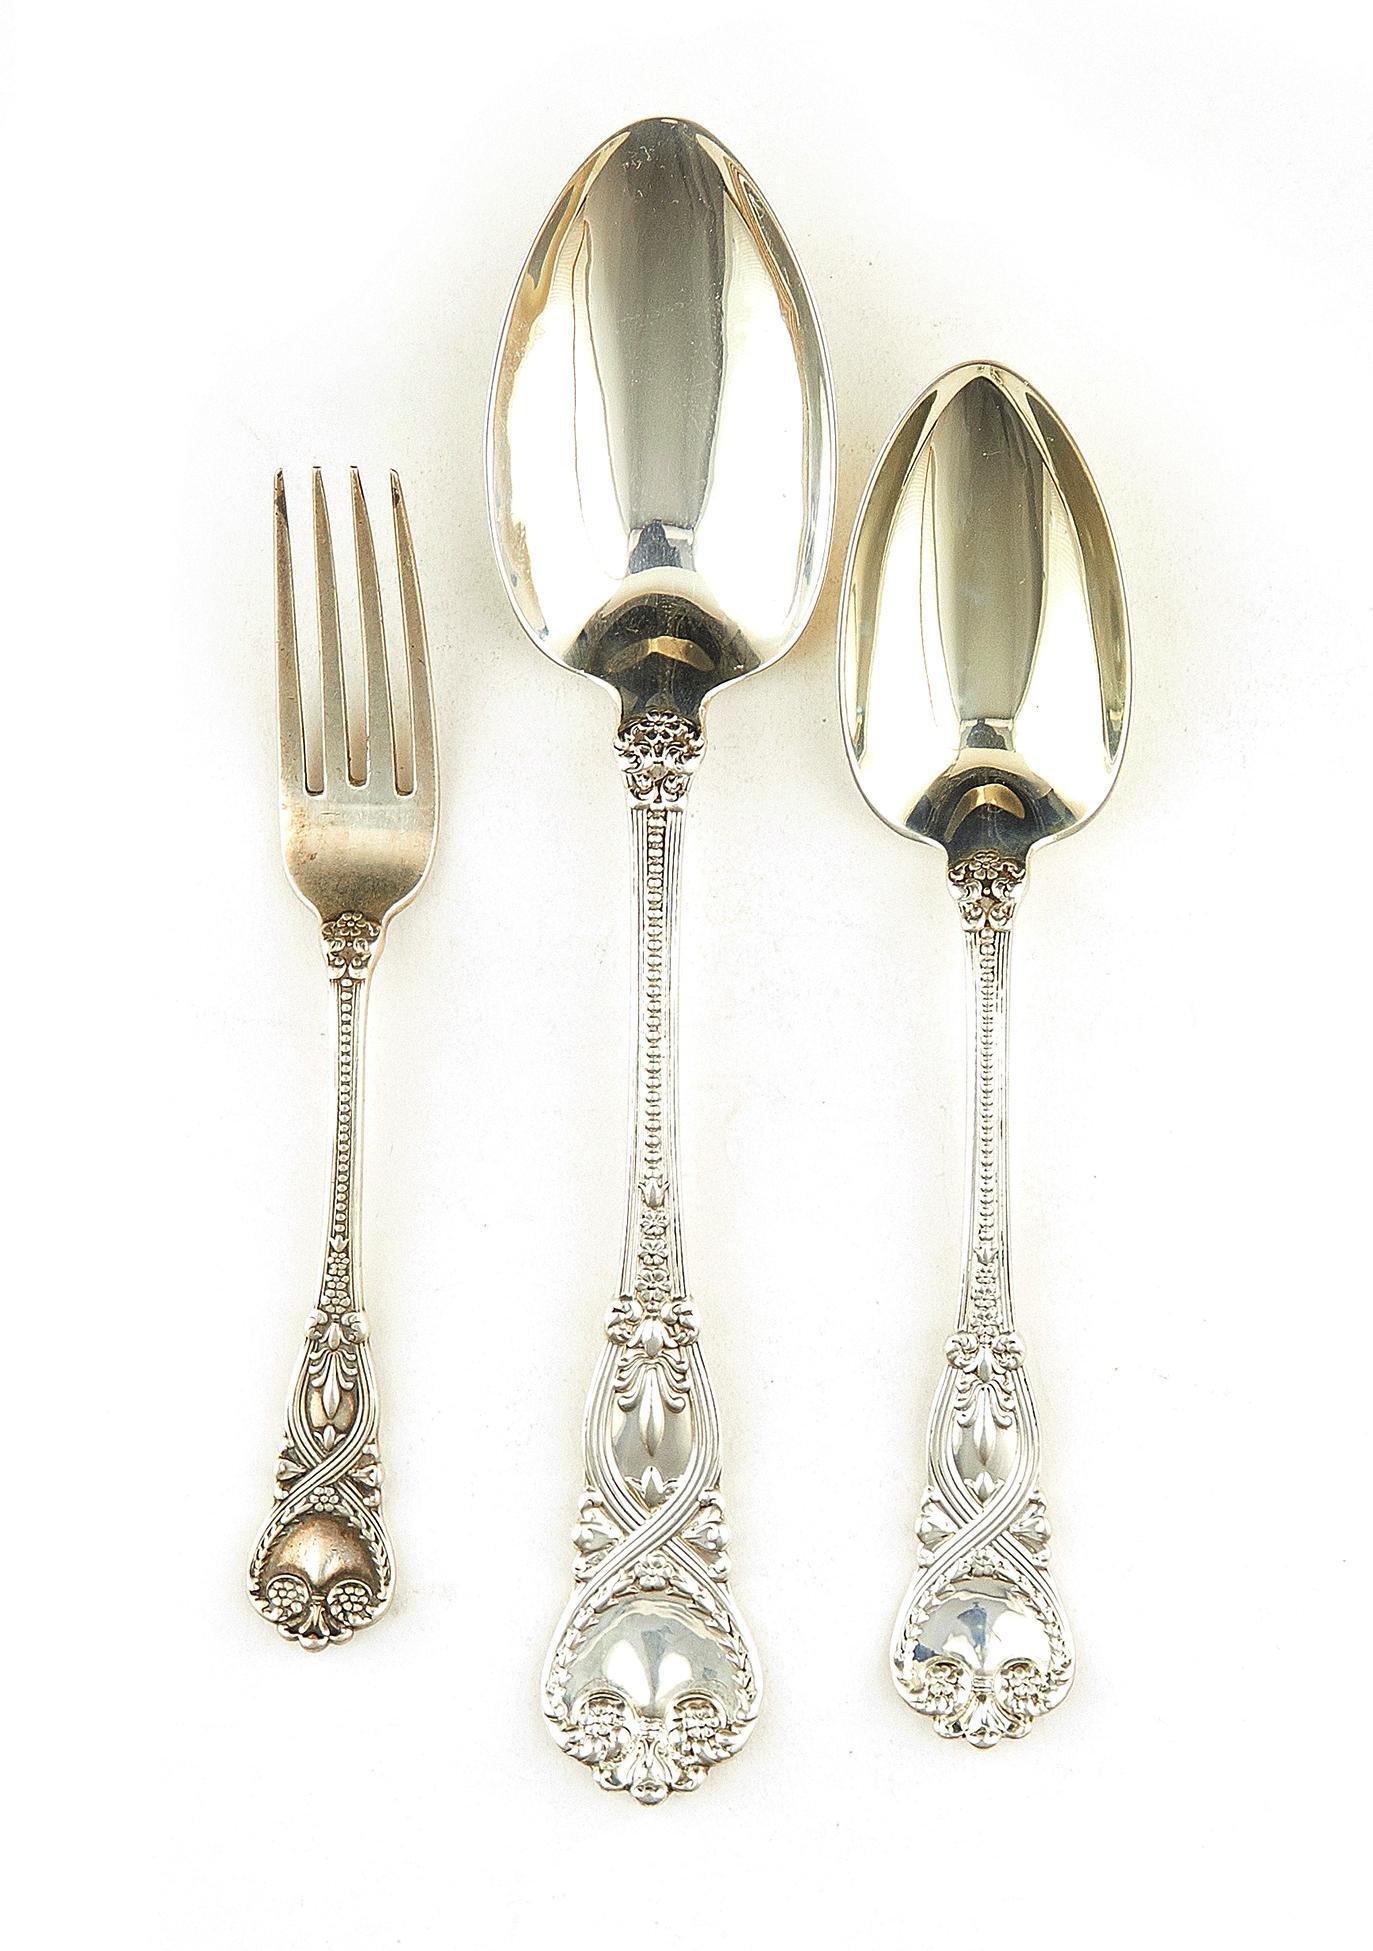 American silver flatware items, Tiffany & Co (8pcs)